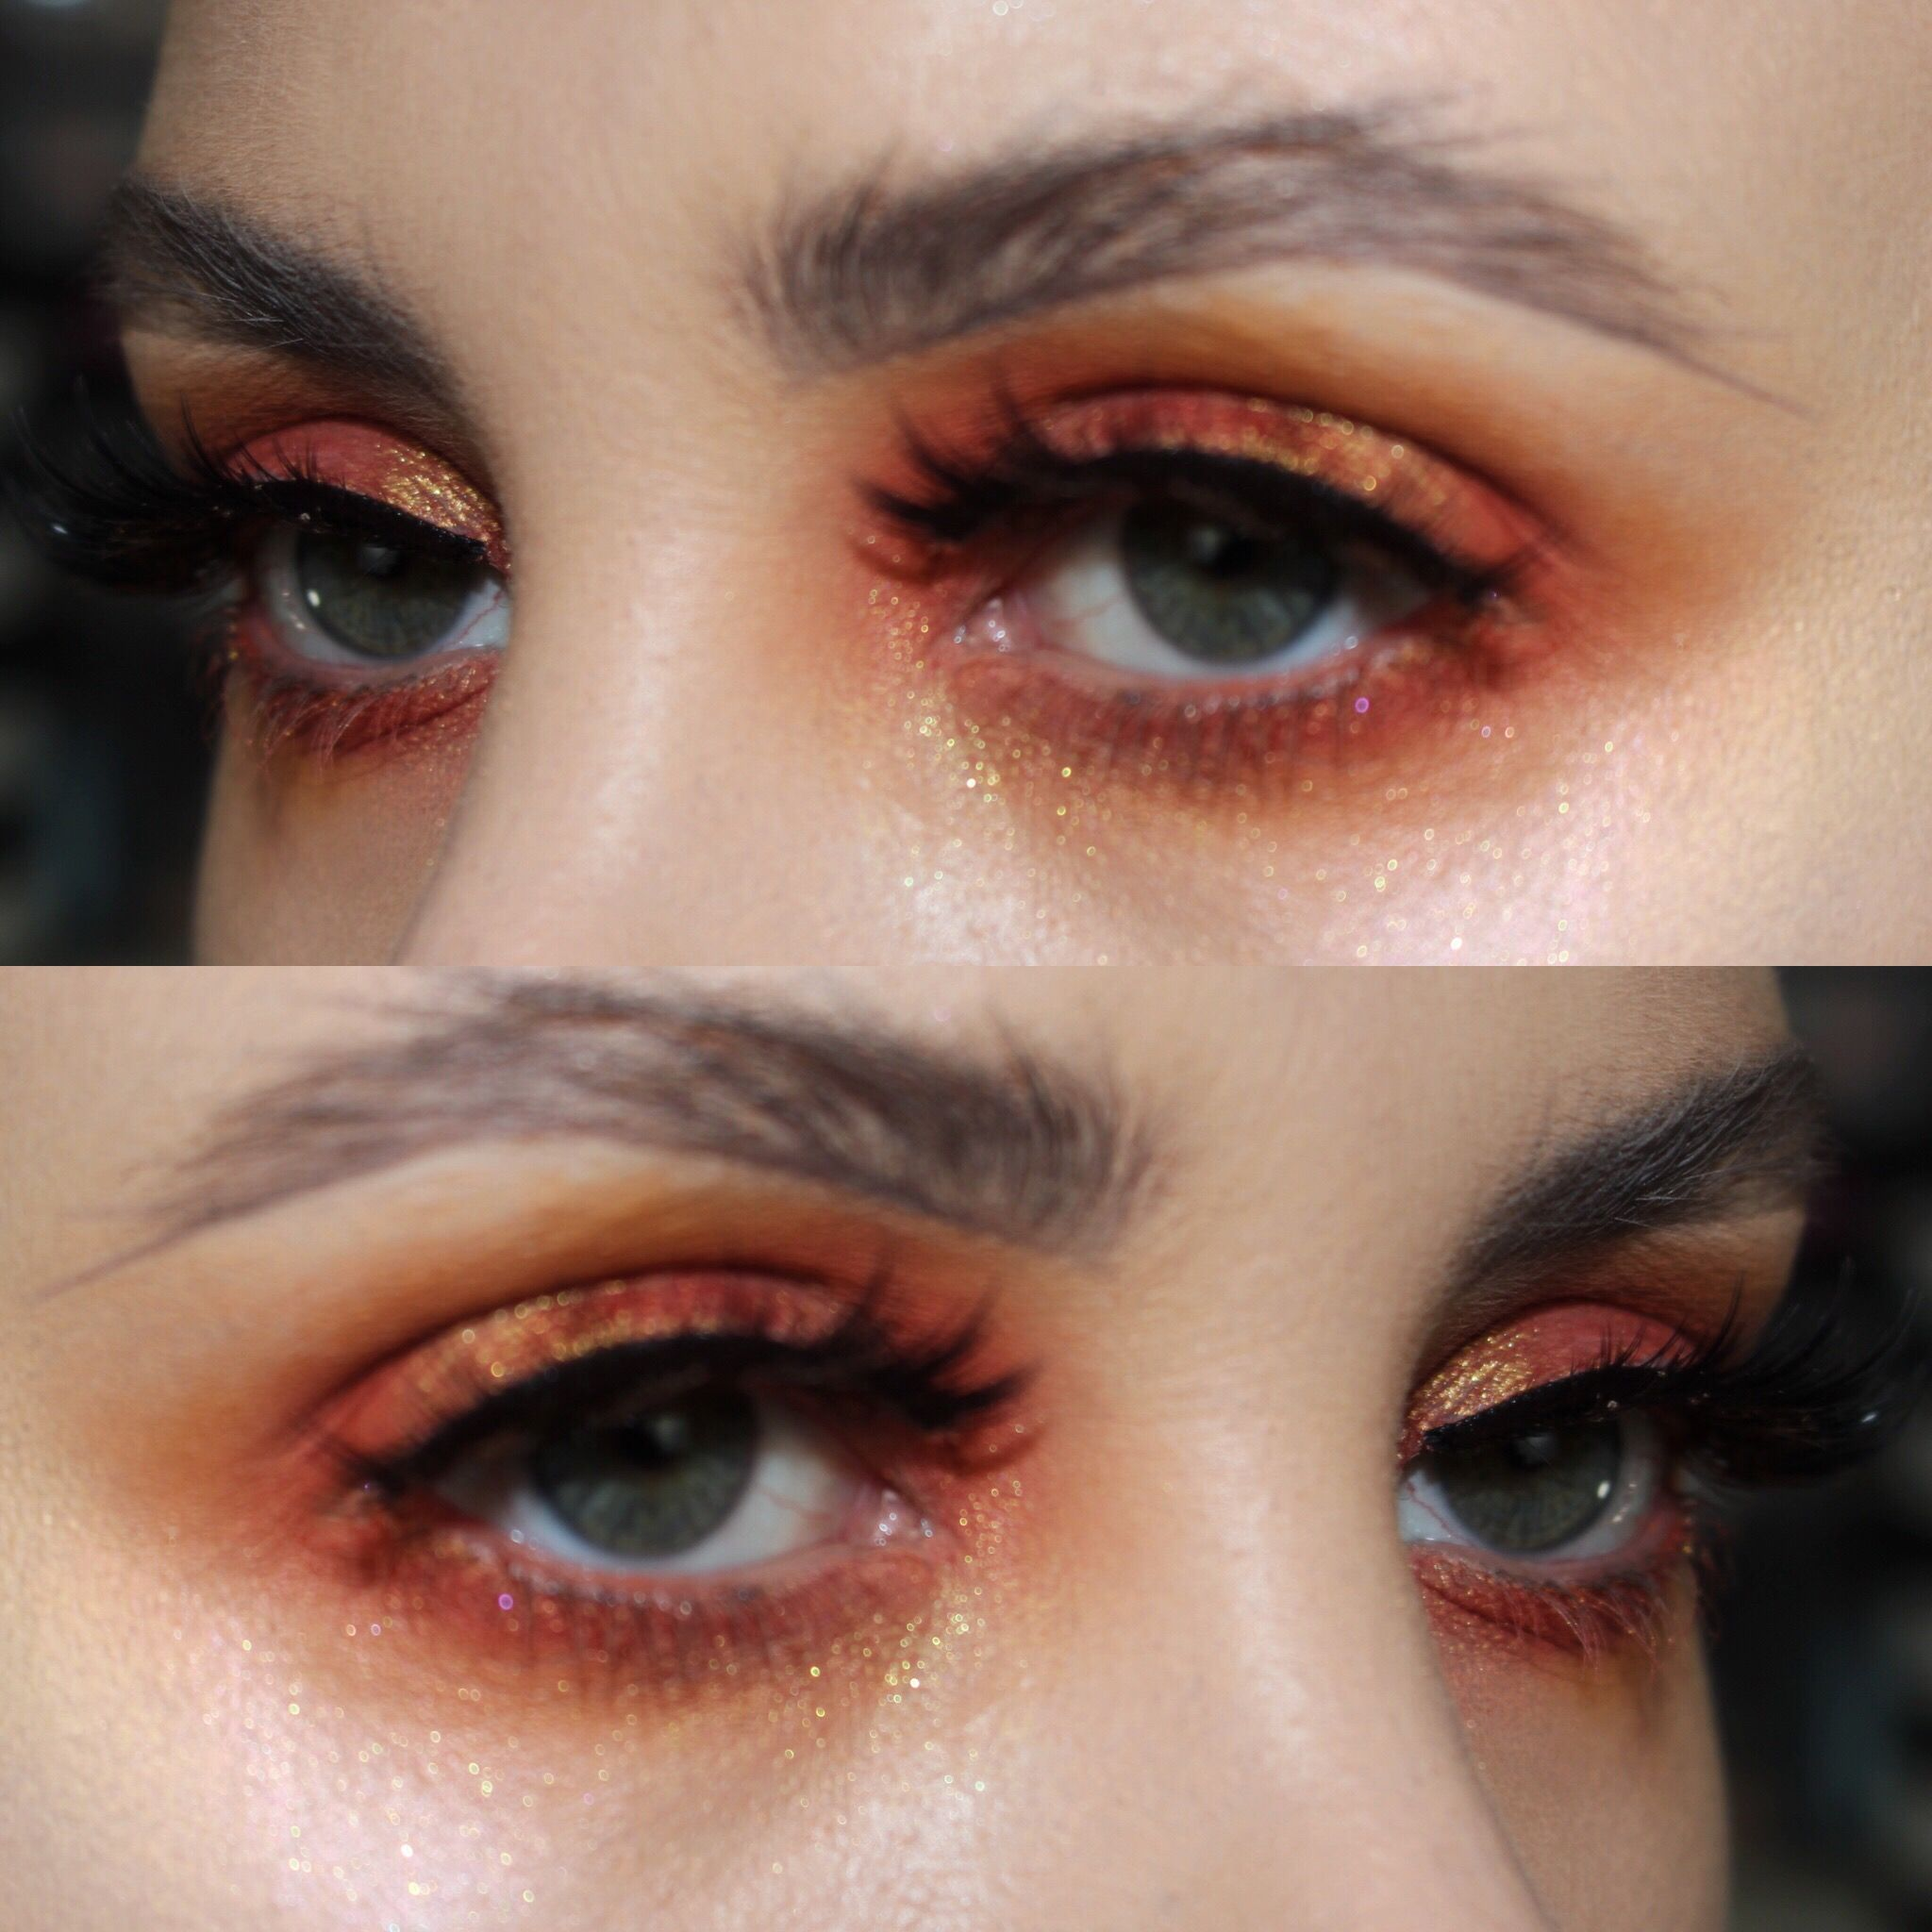 Pin by Elizabeth Rose on Makeup Artistry Artistry makeup